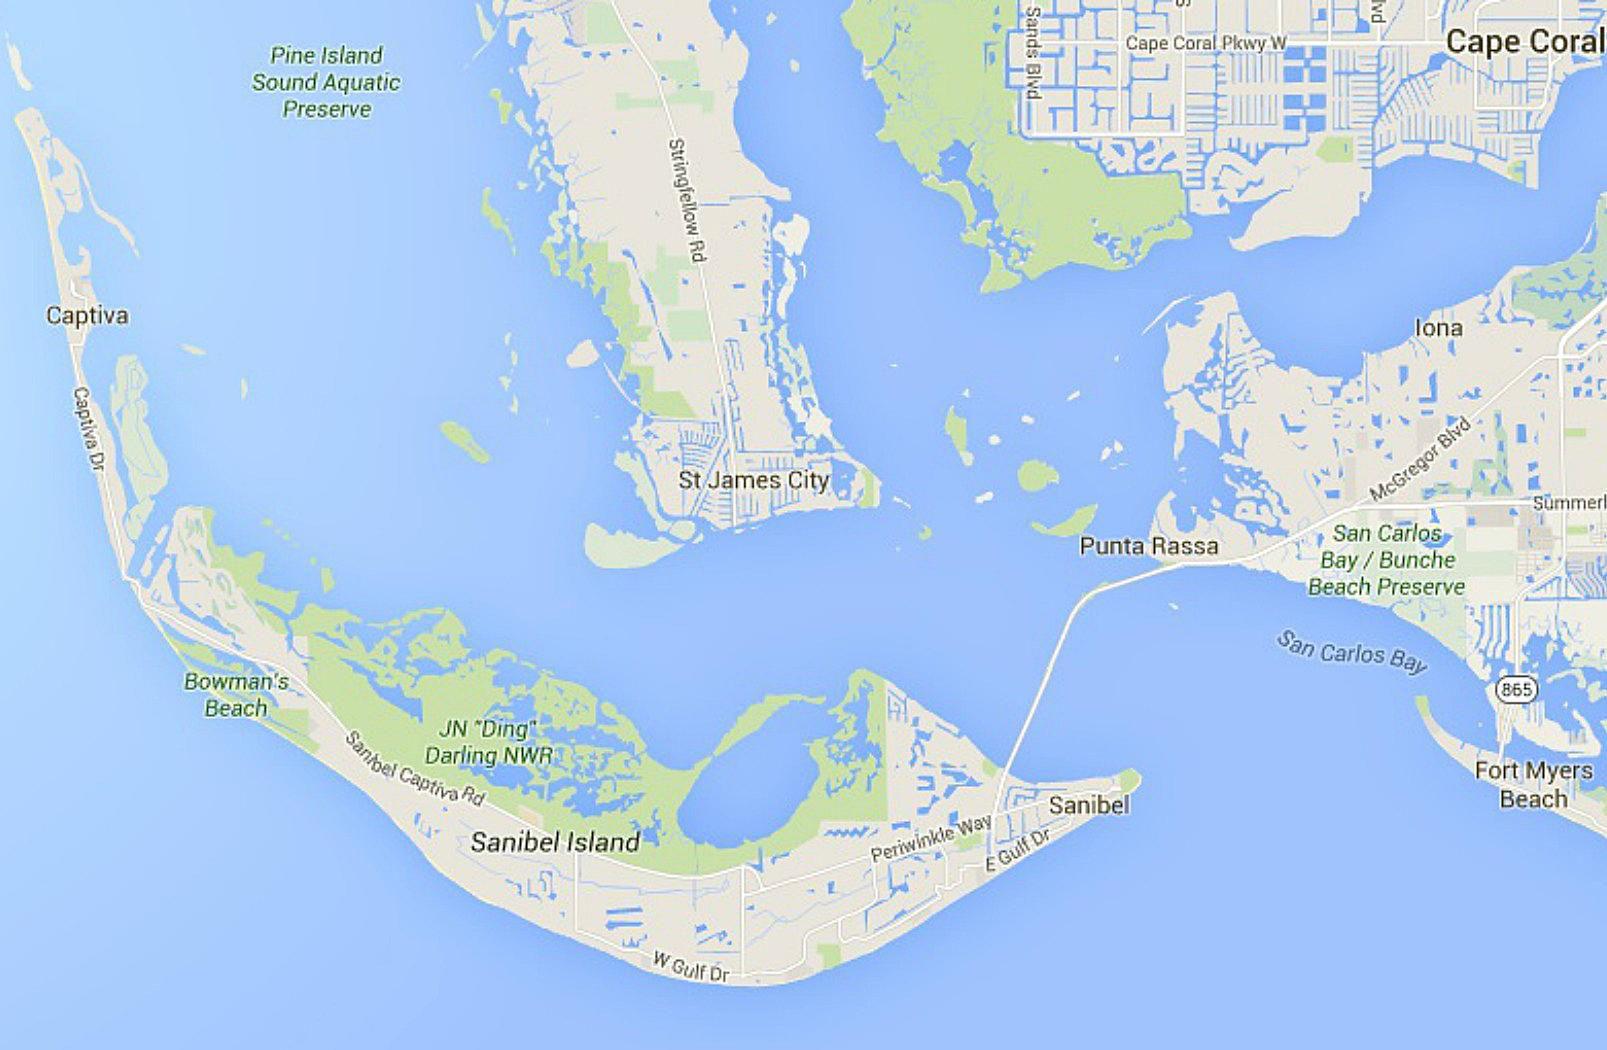 Maps Of Florida: Orlando, Tampa, Miami, Keys, And More - Emerald Island Florida Map